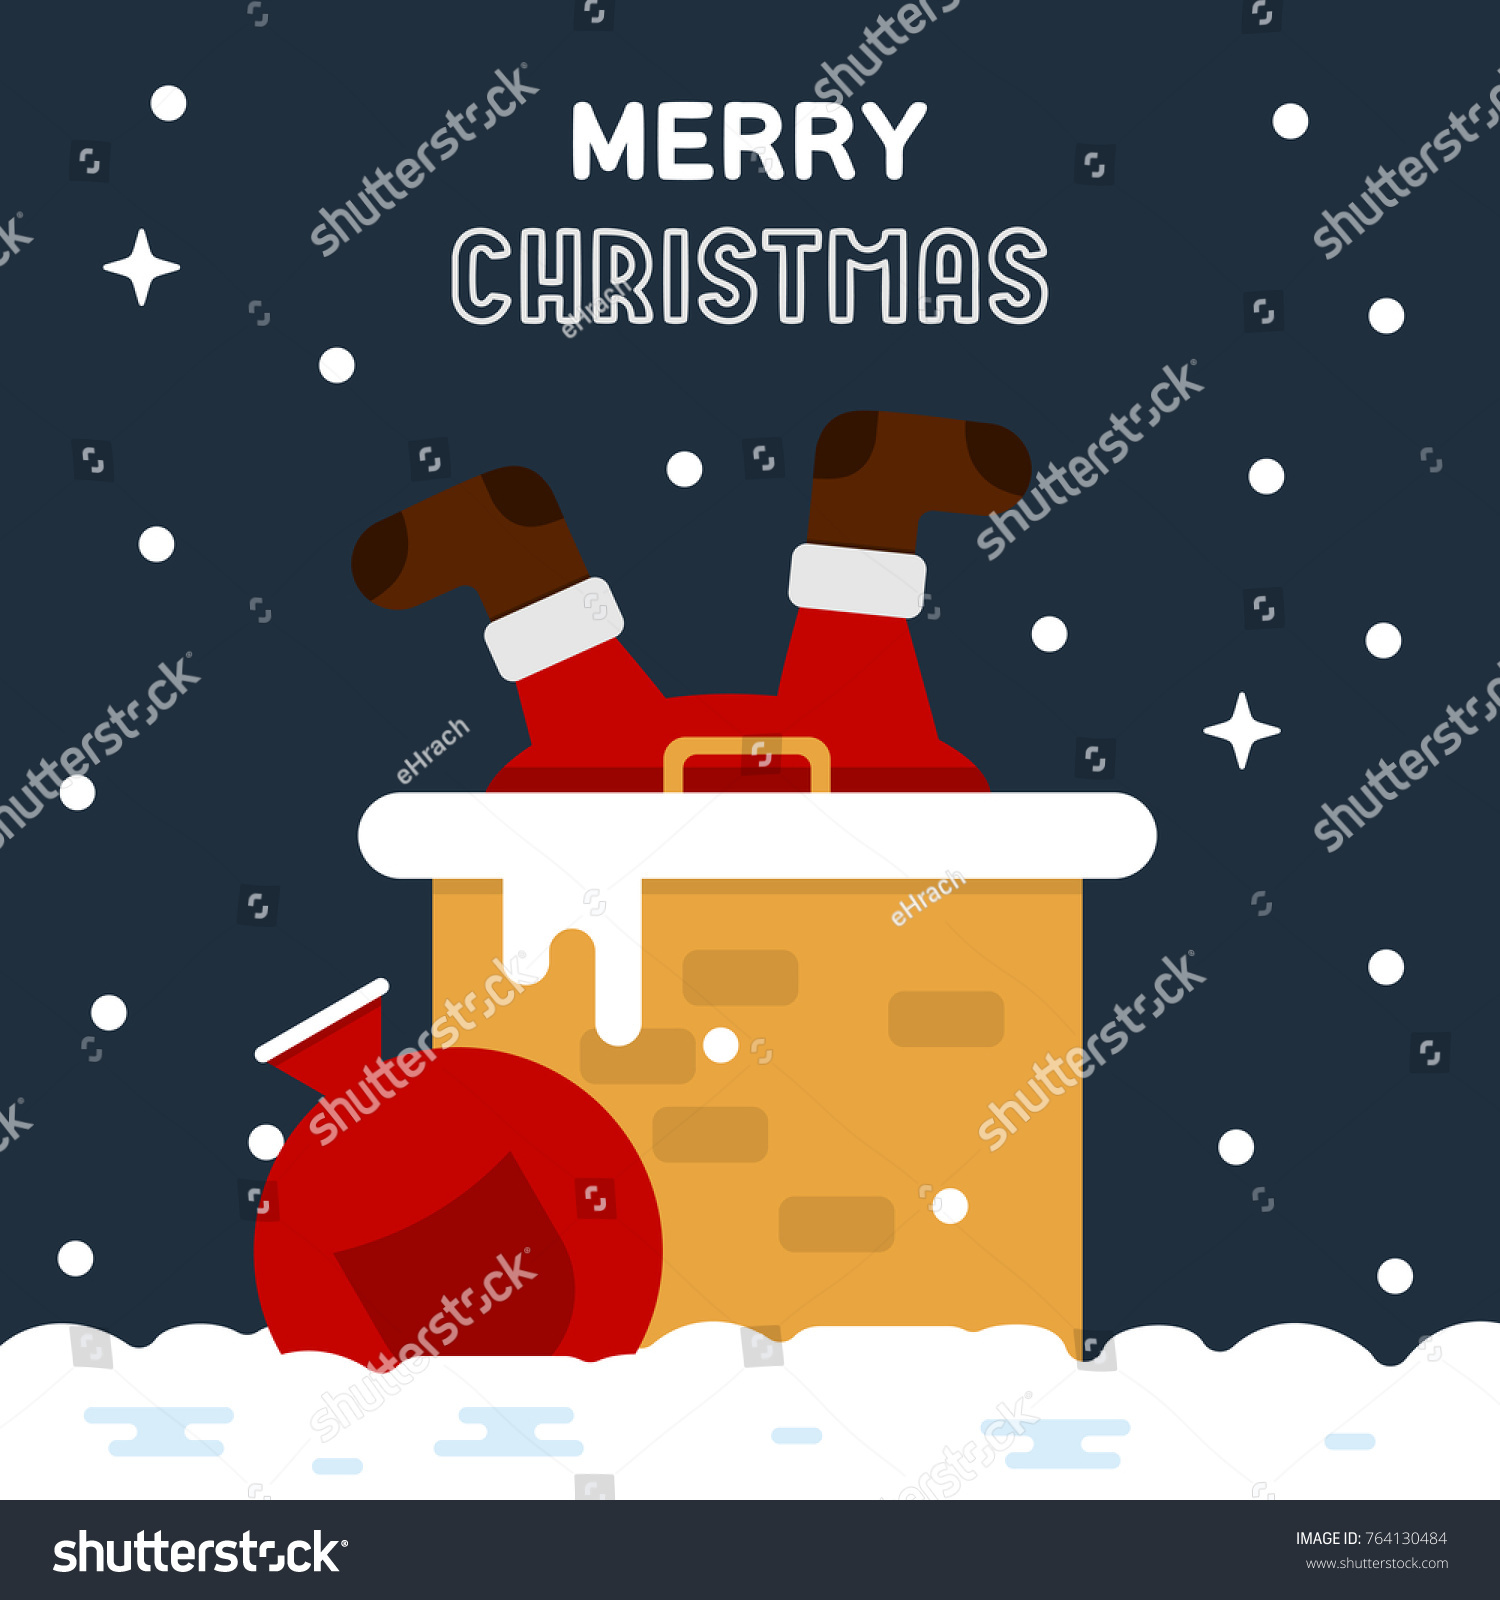 Merry Christmas Funny Greeting Card Santa Stock Vector (Royalty Free ...